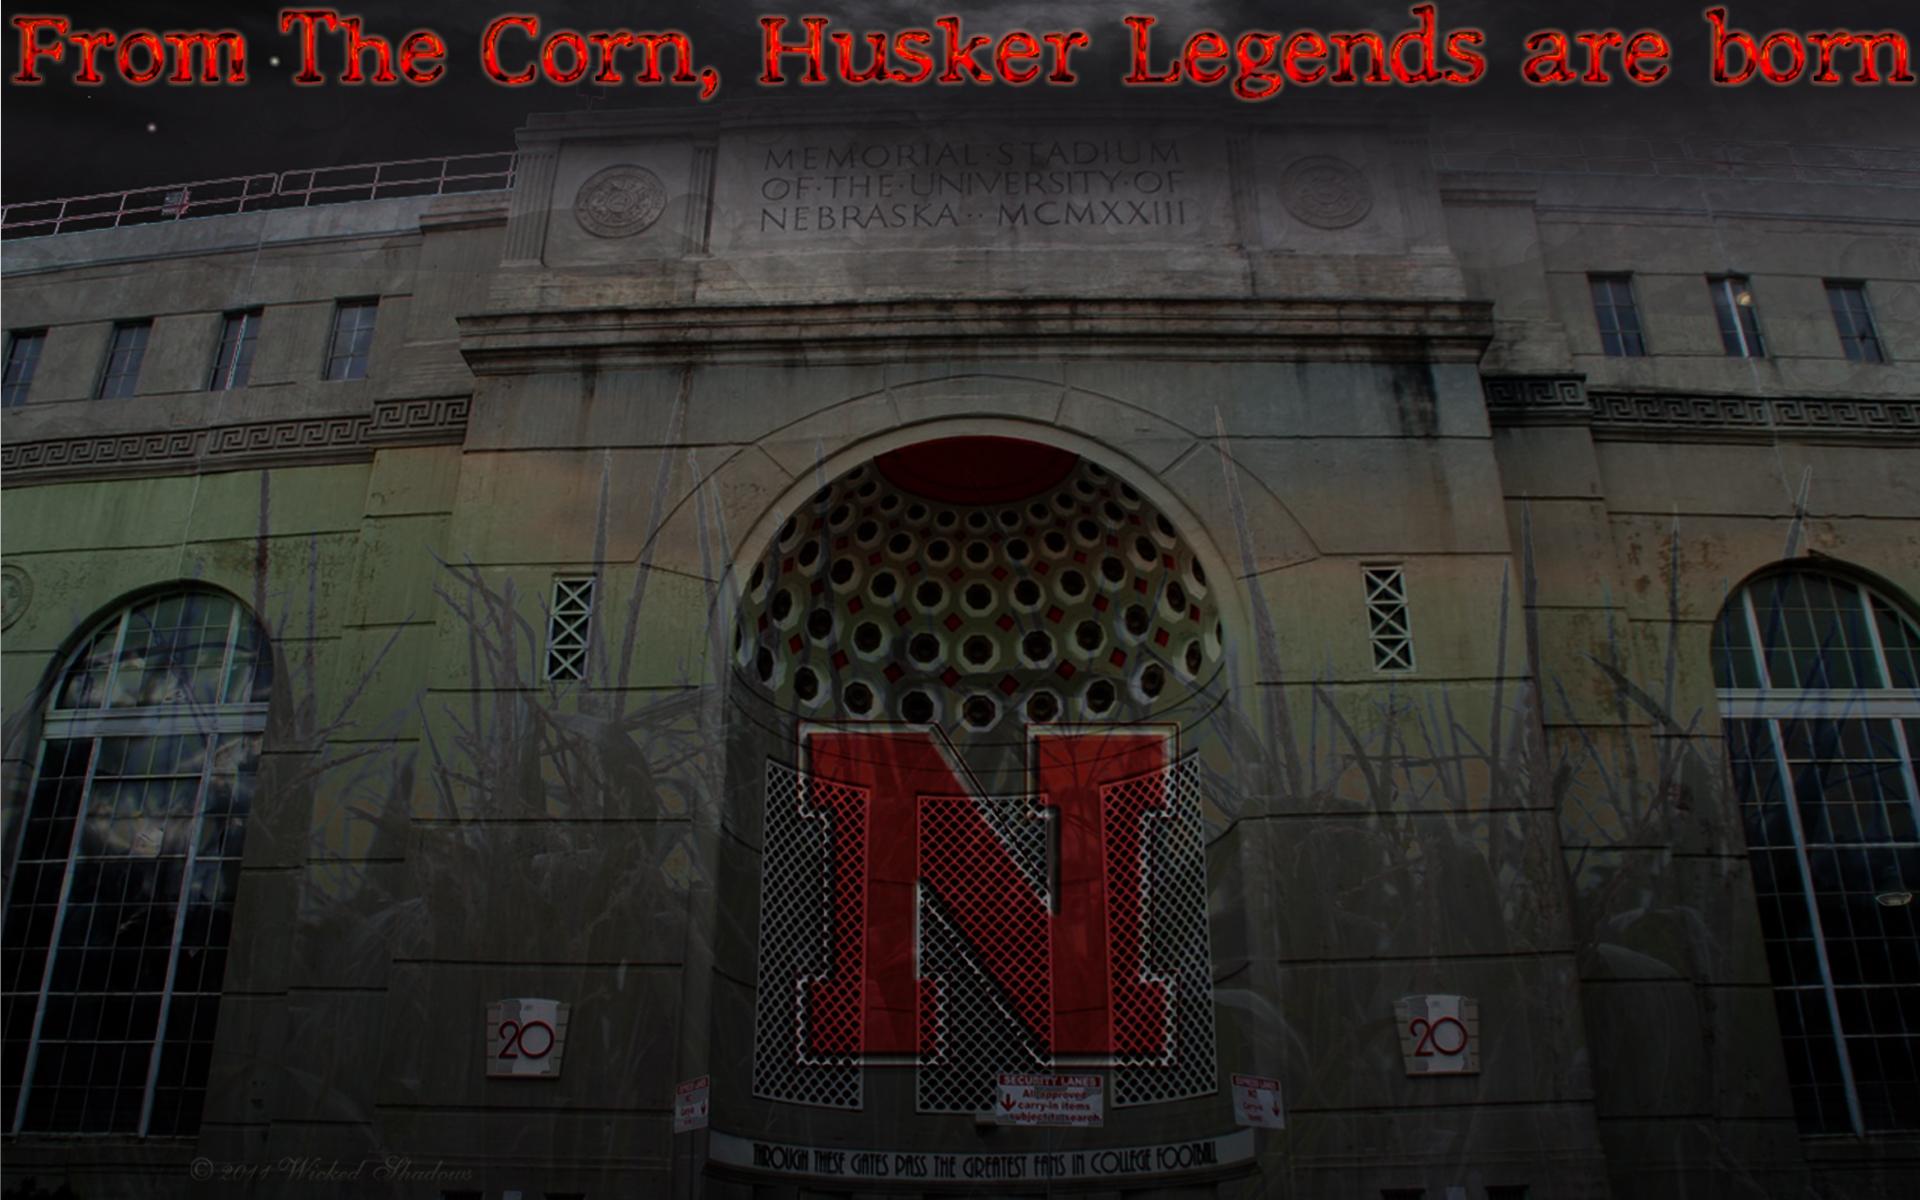 memorial stadium nebraska cornhuskers wallpaper legends 1920x1200